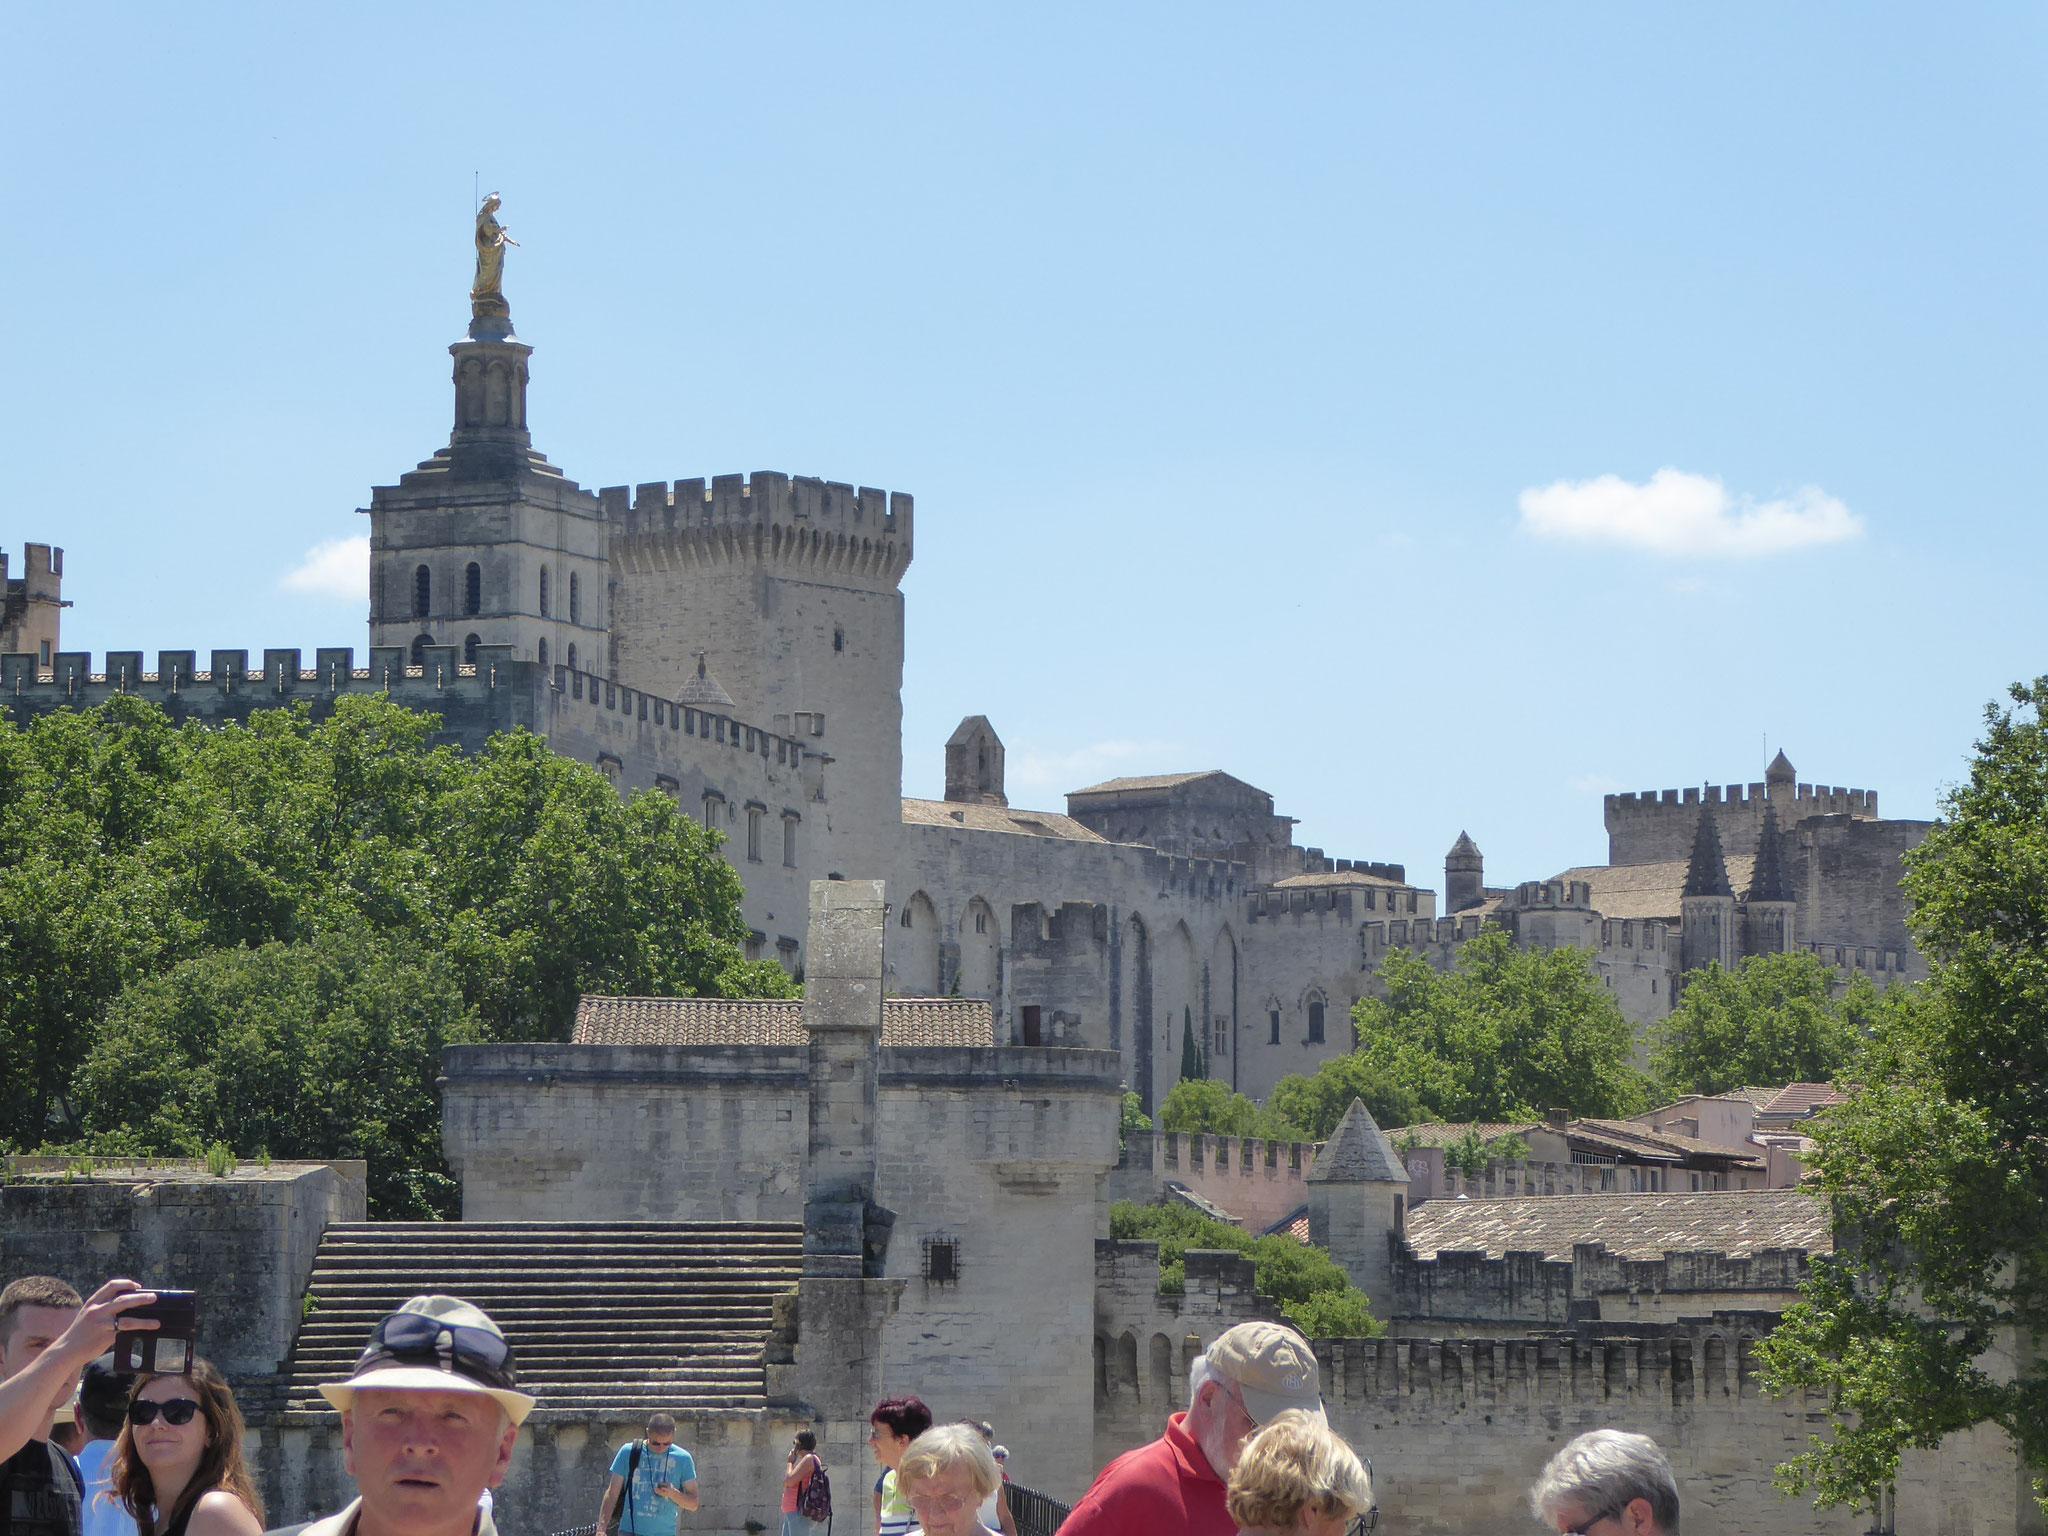 Blick auf den Papstpalast in Avignon